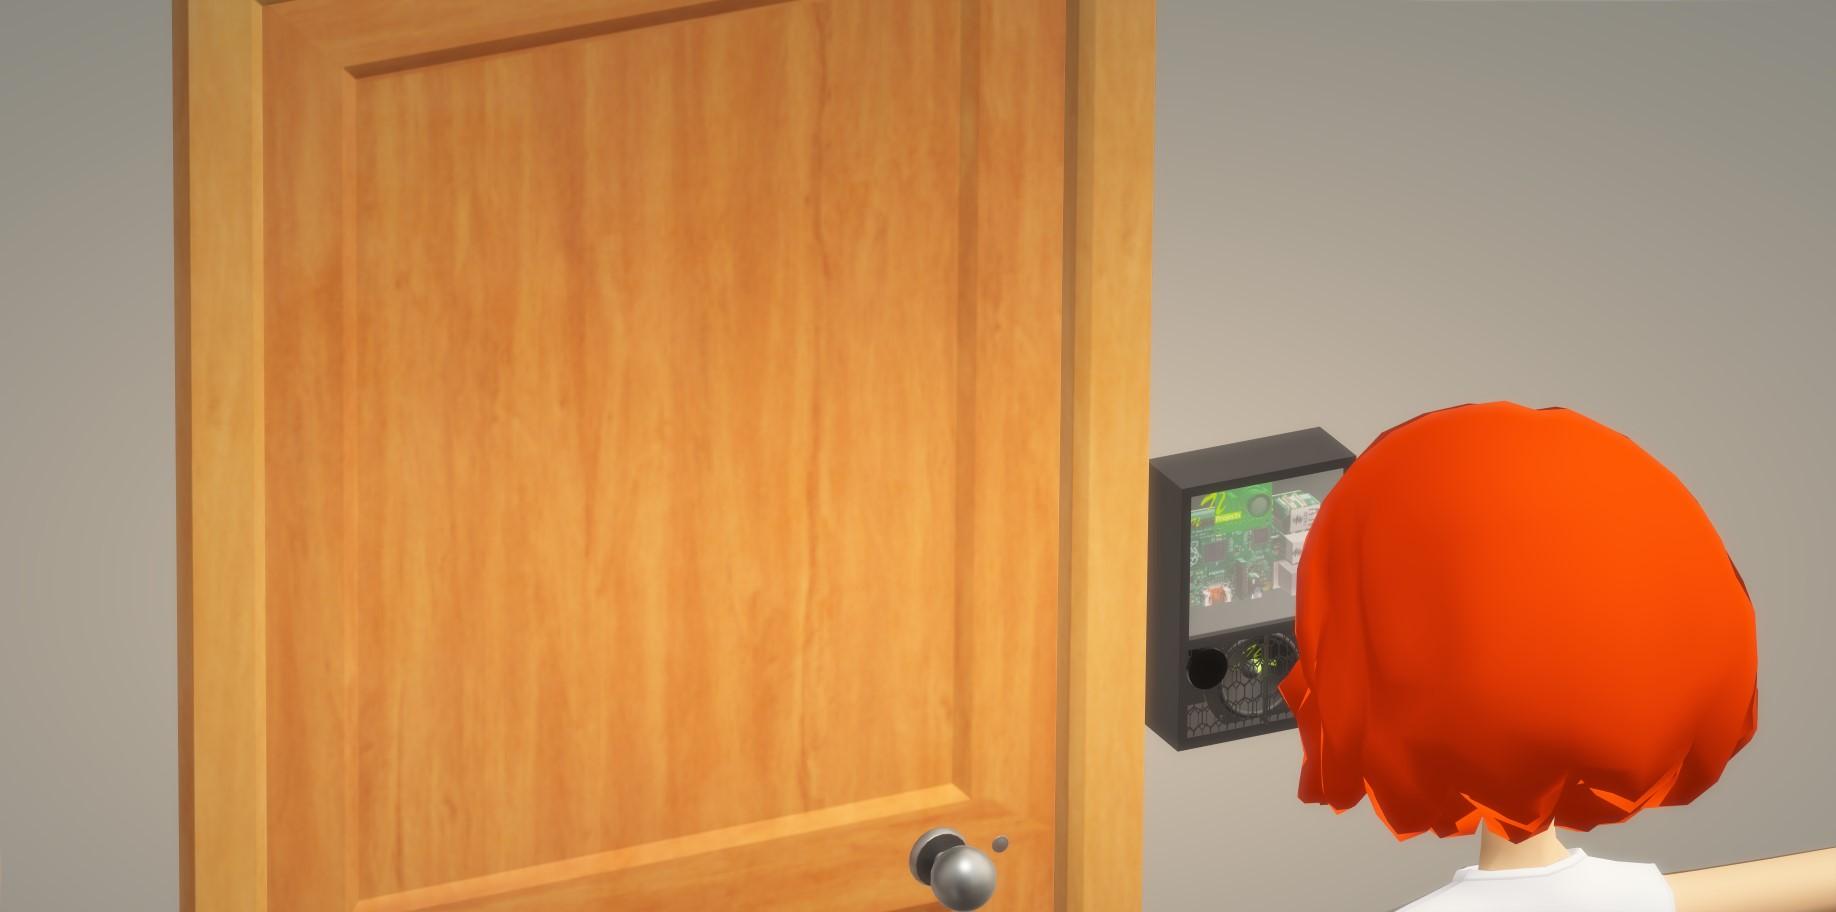 Contactless IOT Doorbell & Security System